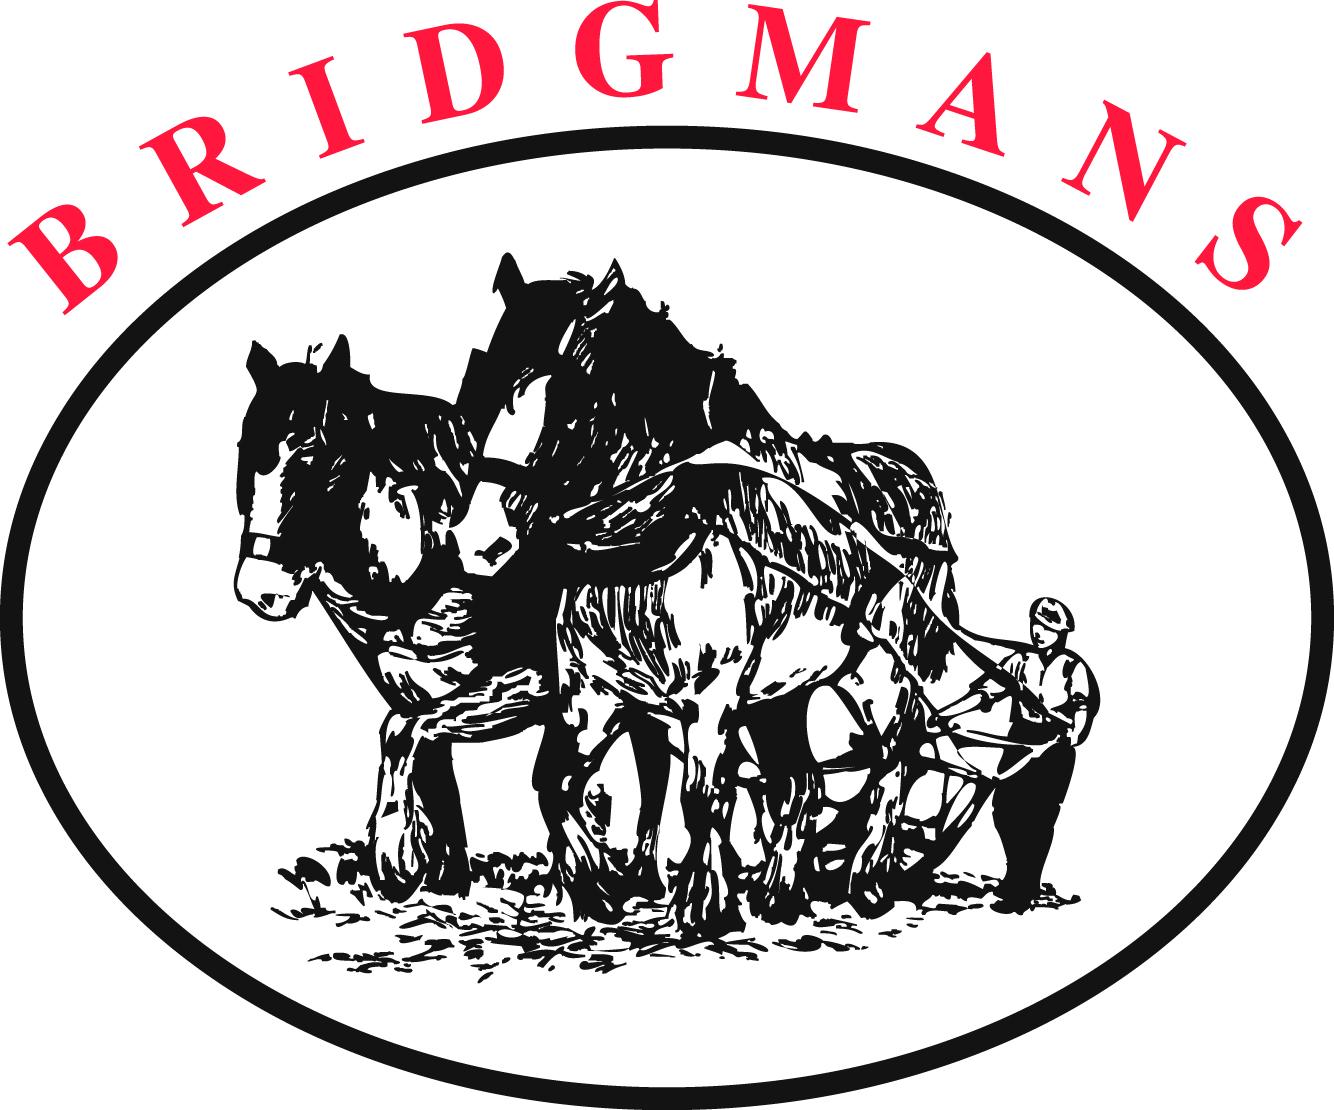 Bridgmans logo new colour.jpg